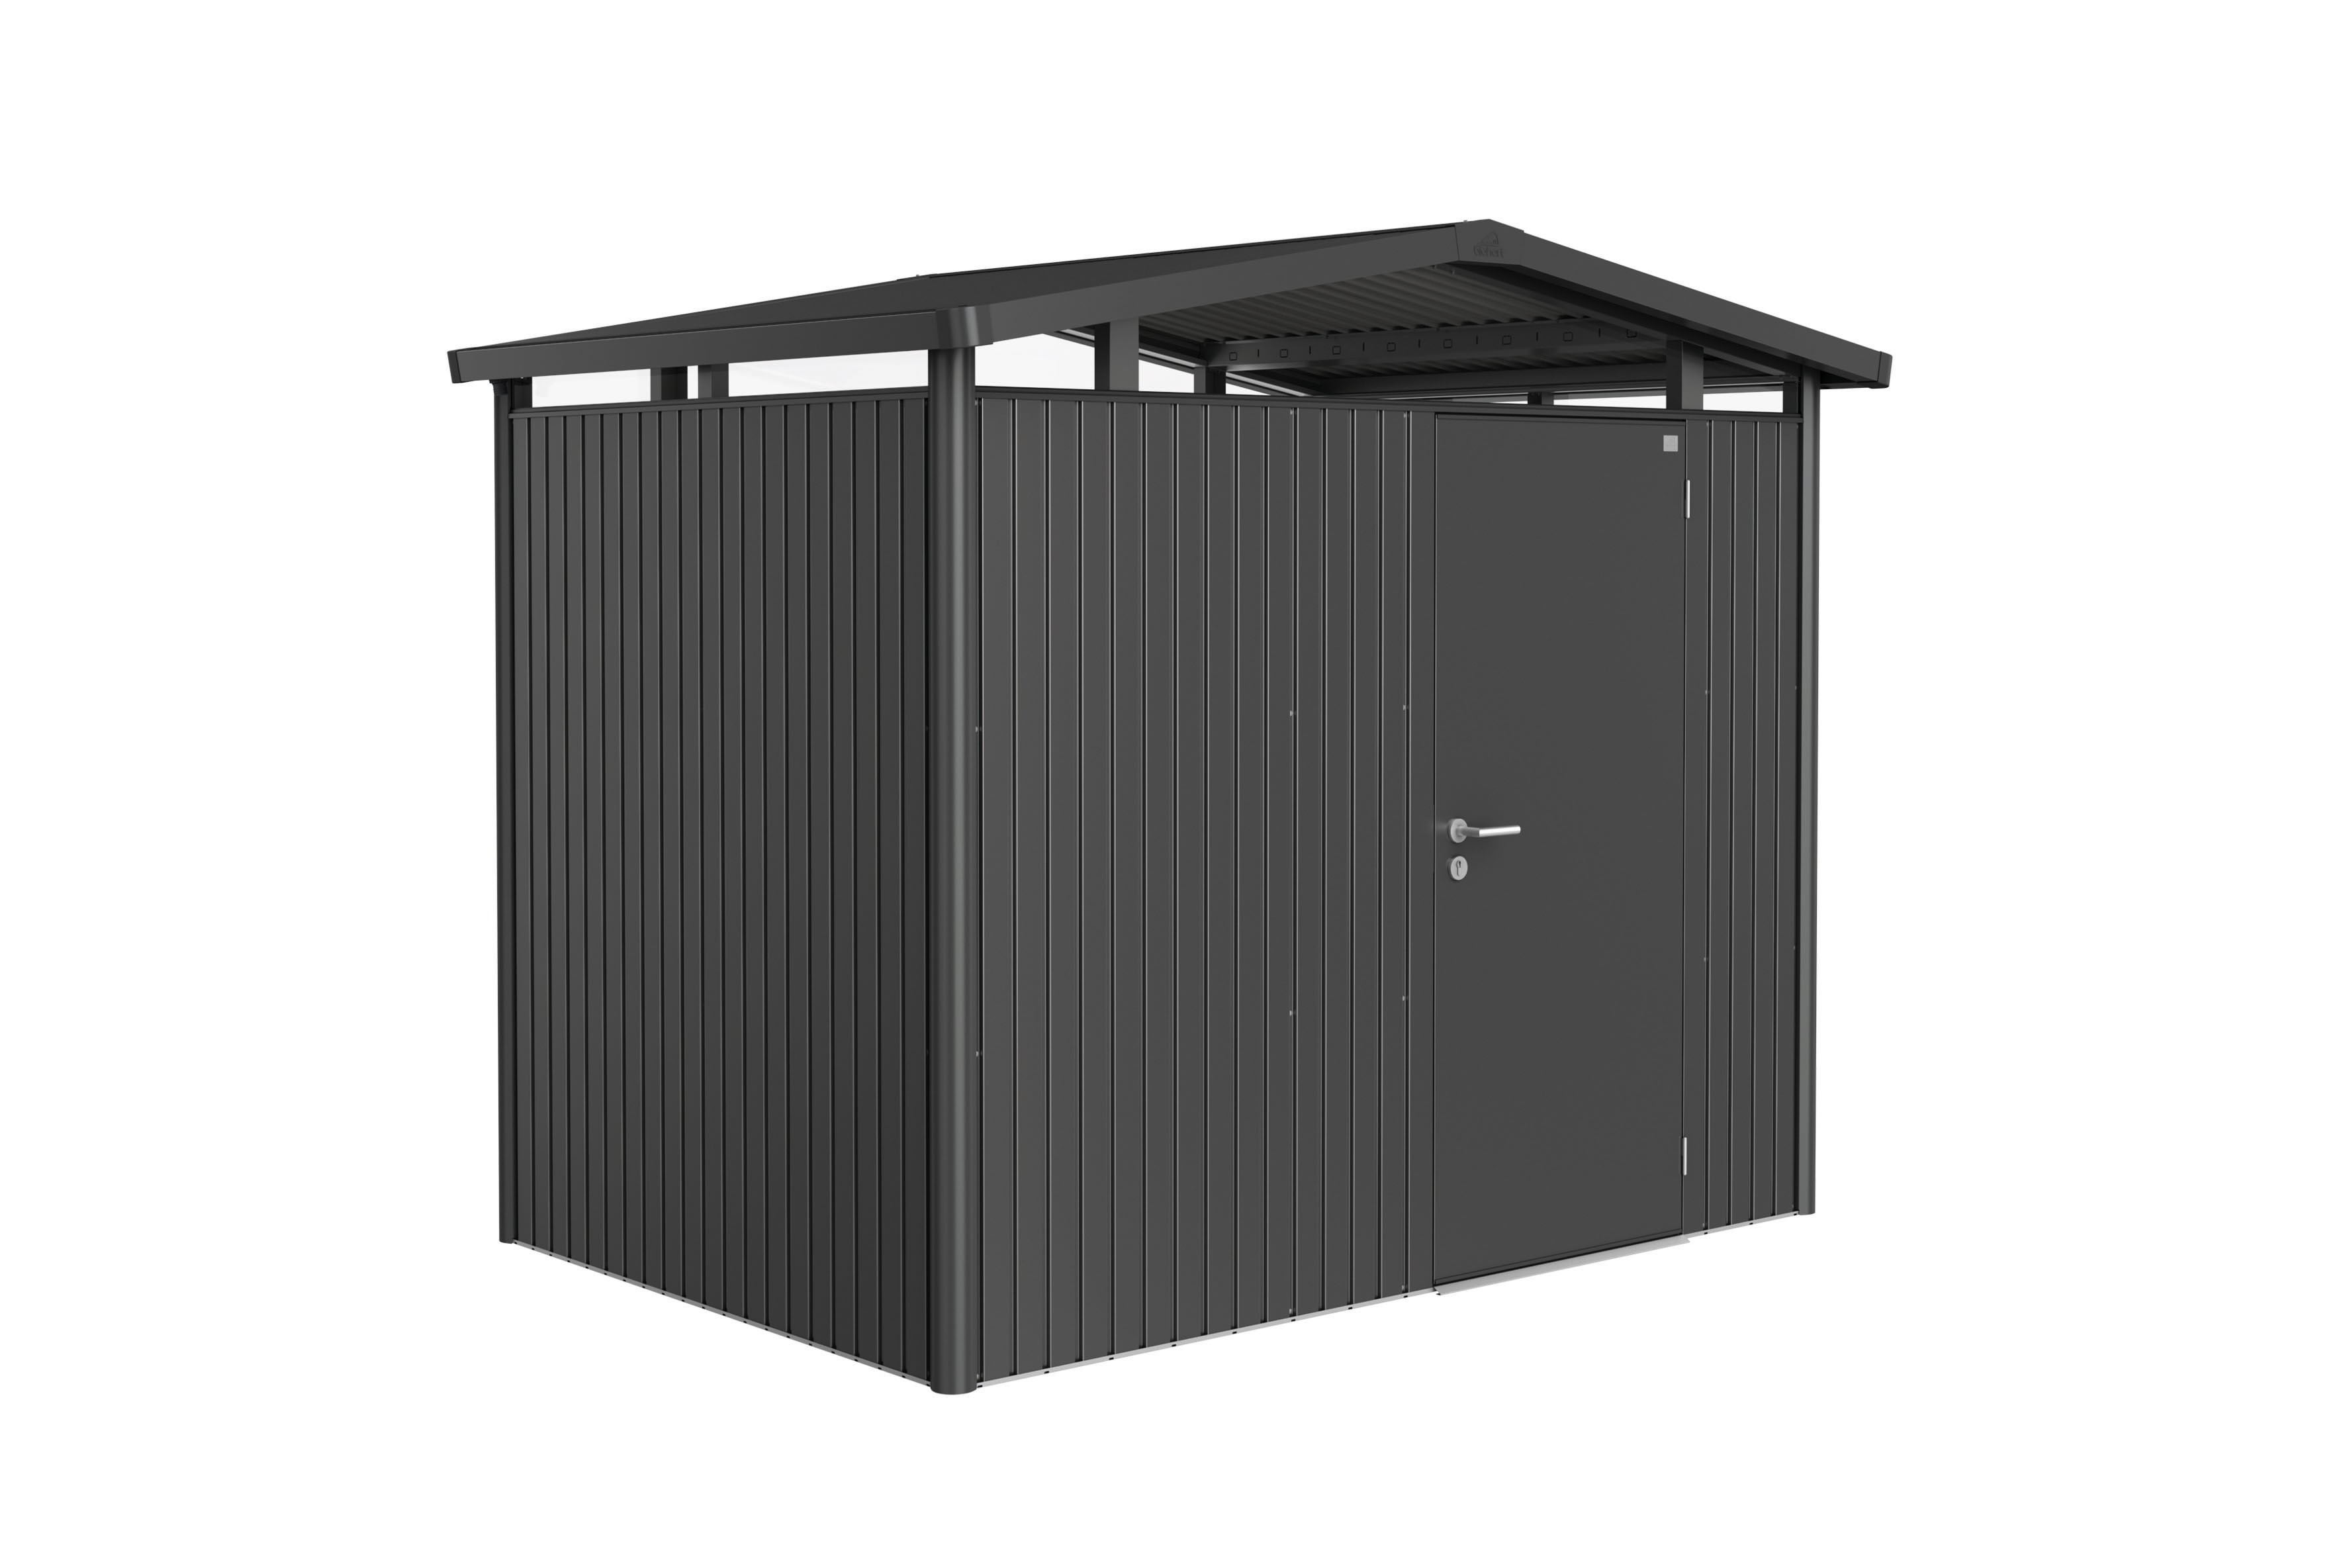 Biohort panorama metal tool shed metal garden shed